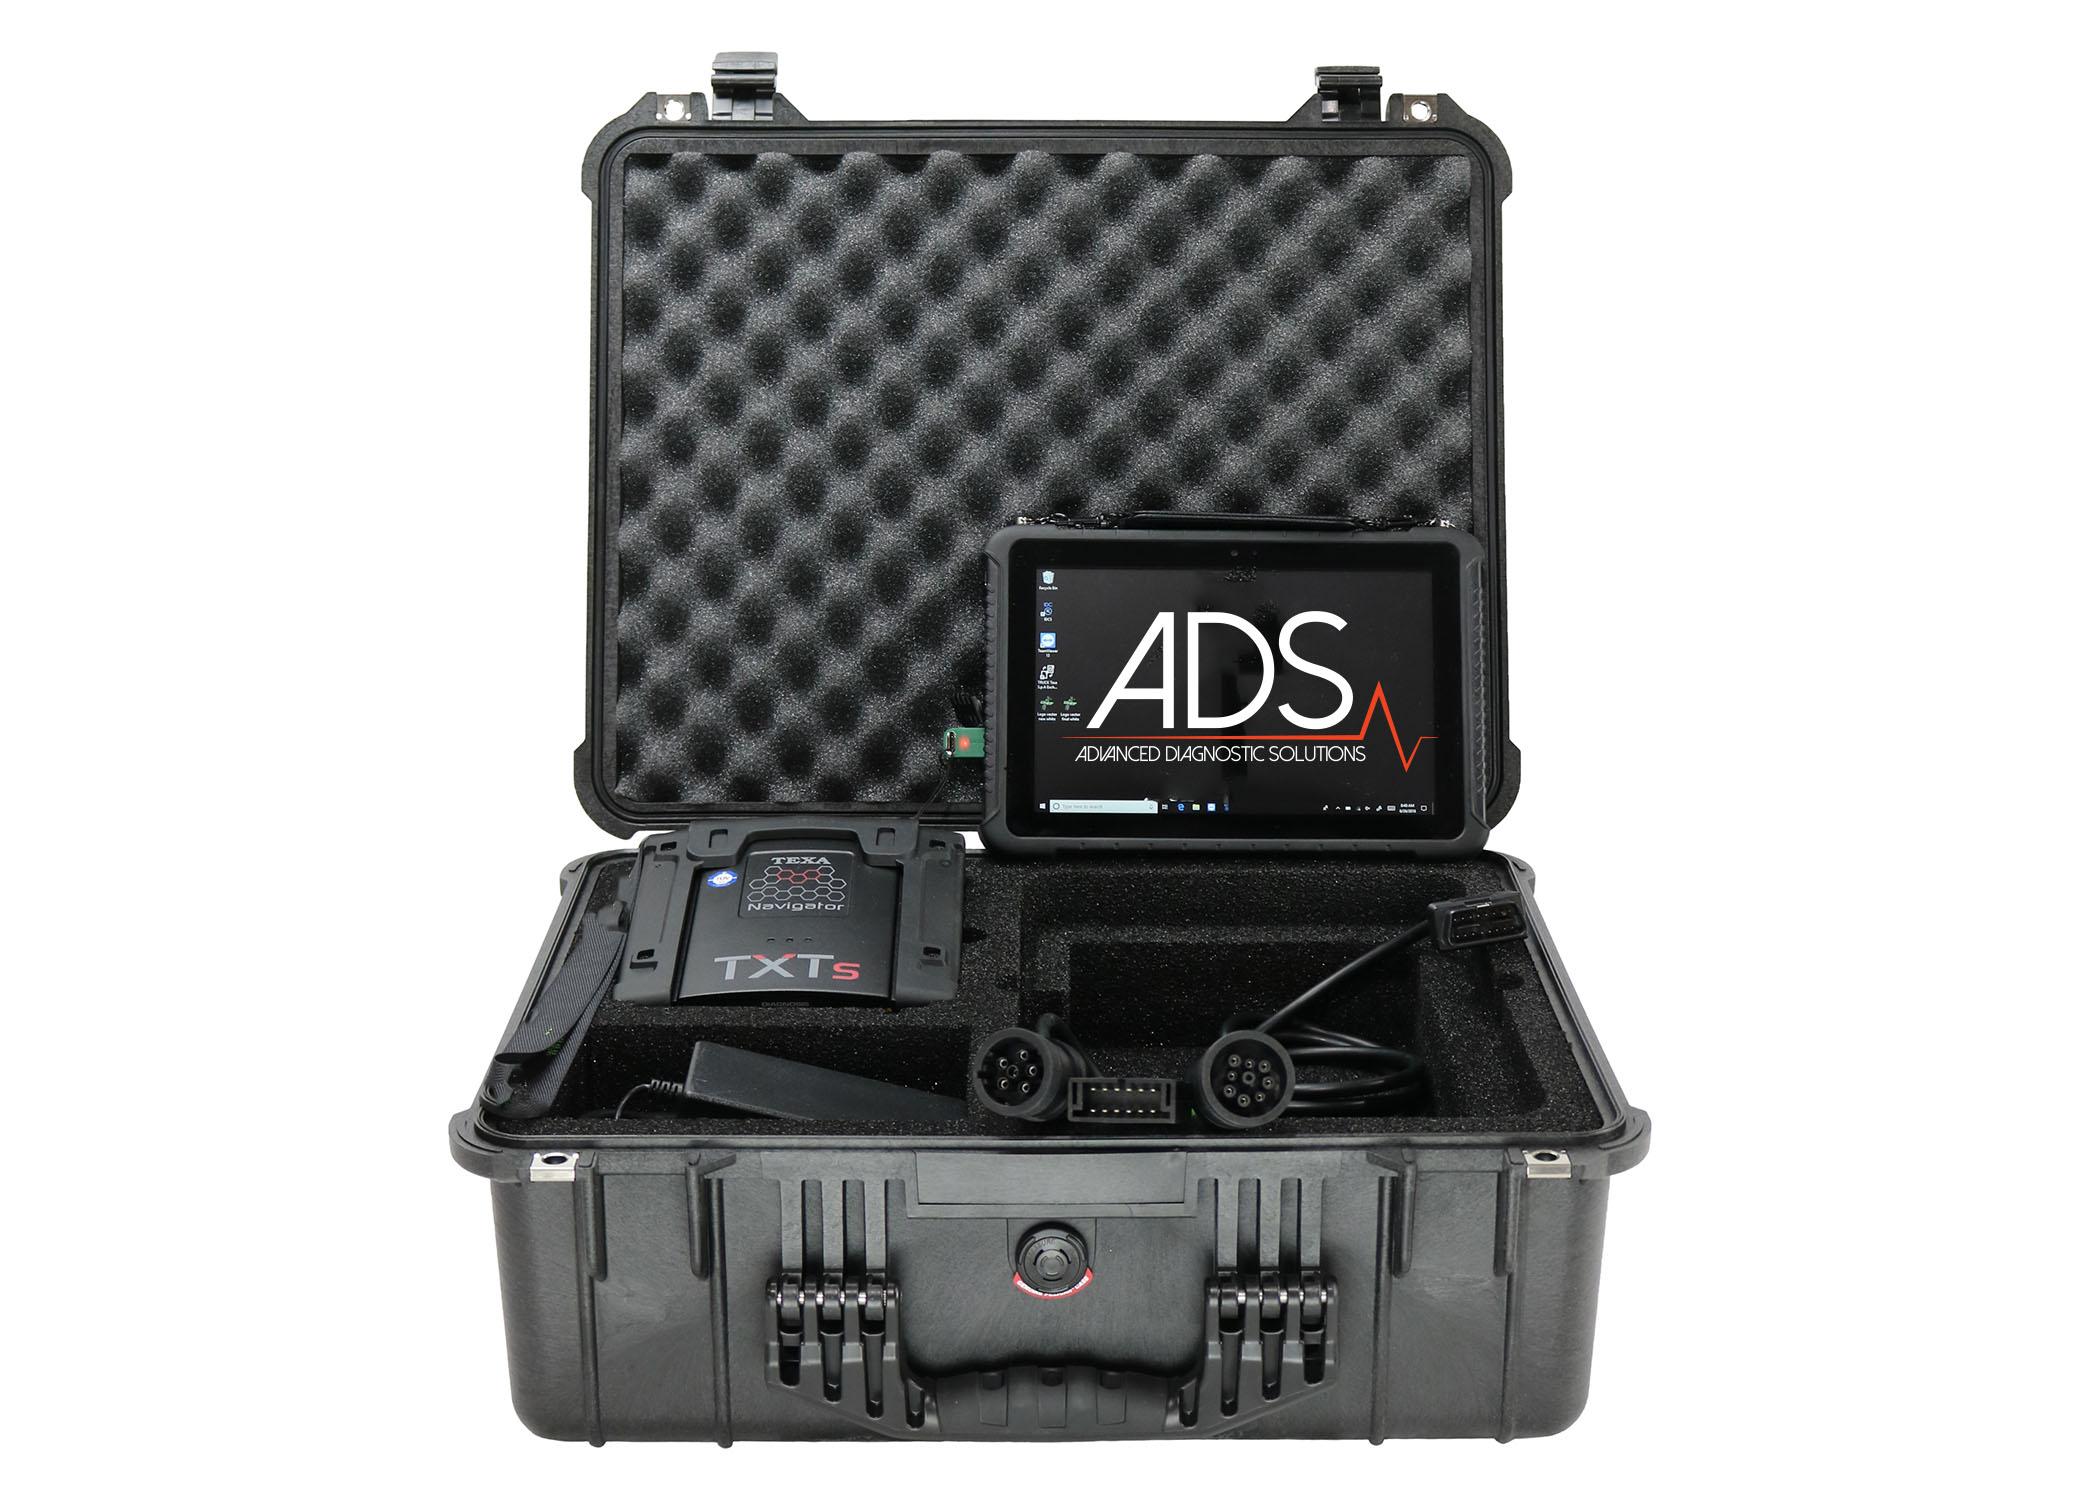 Texa Hd Truck  U0026 Off-highway Kit With 10 U0026quot  Rugged Tablet